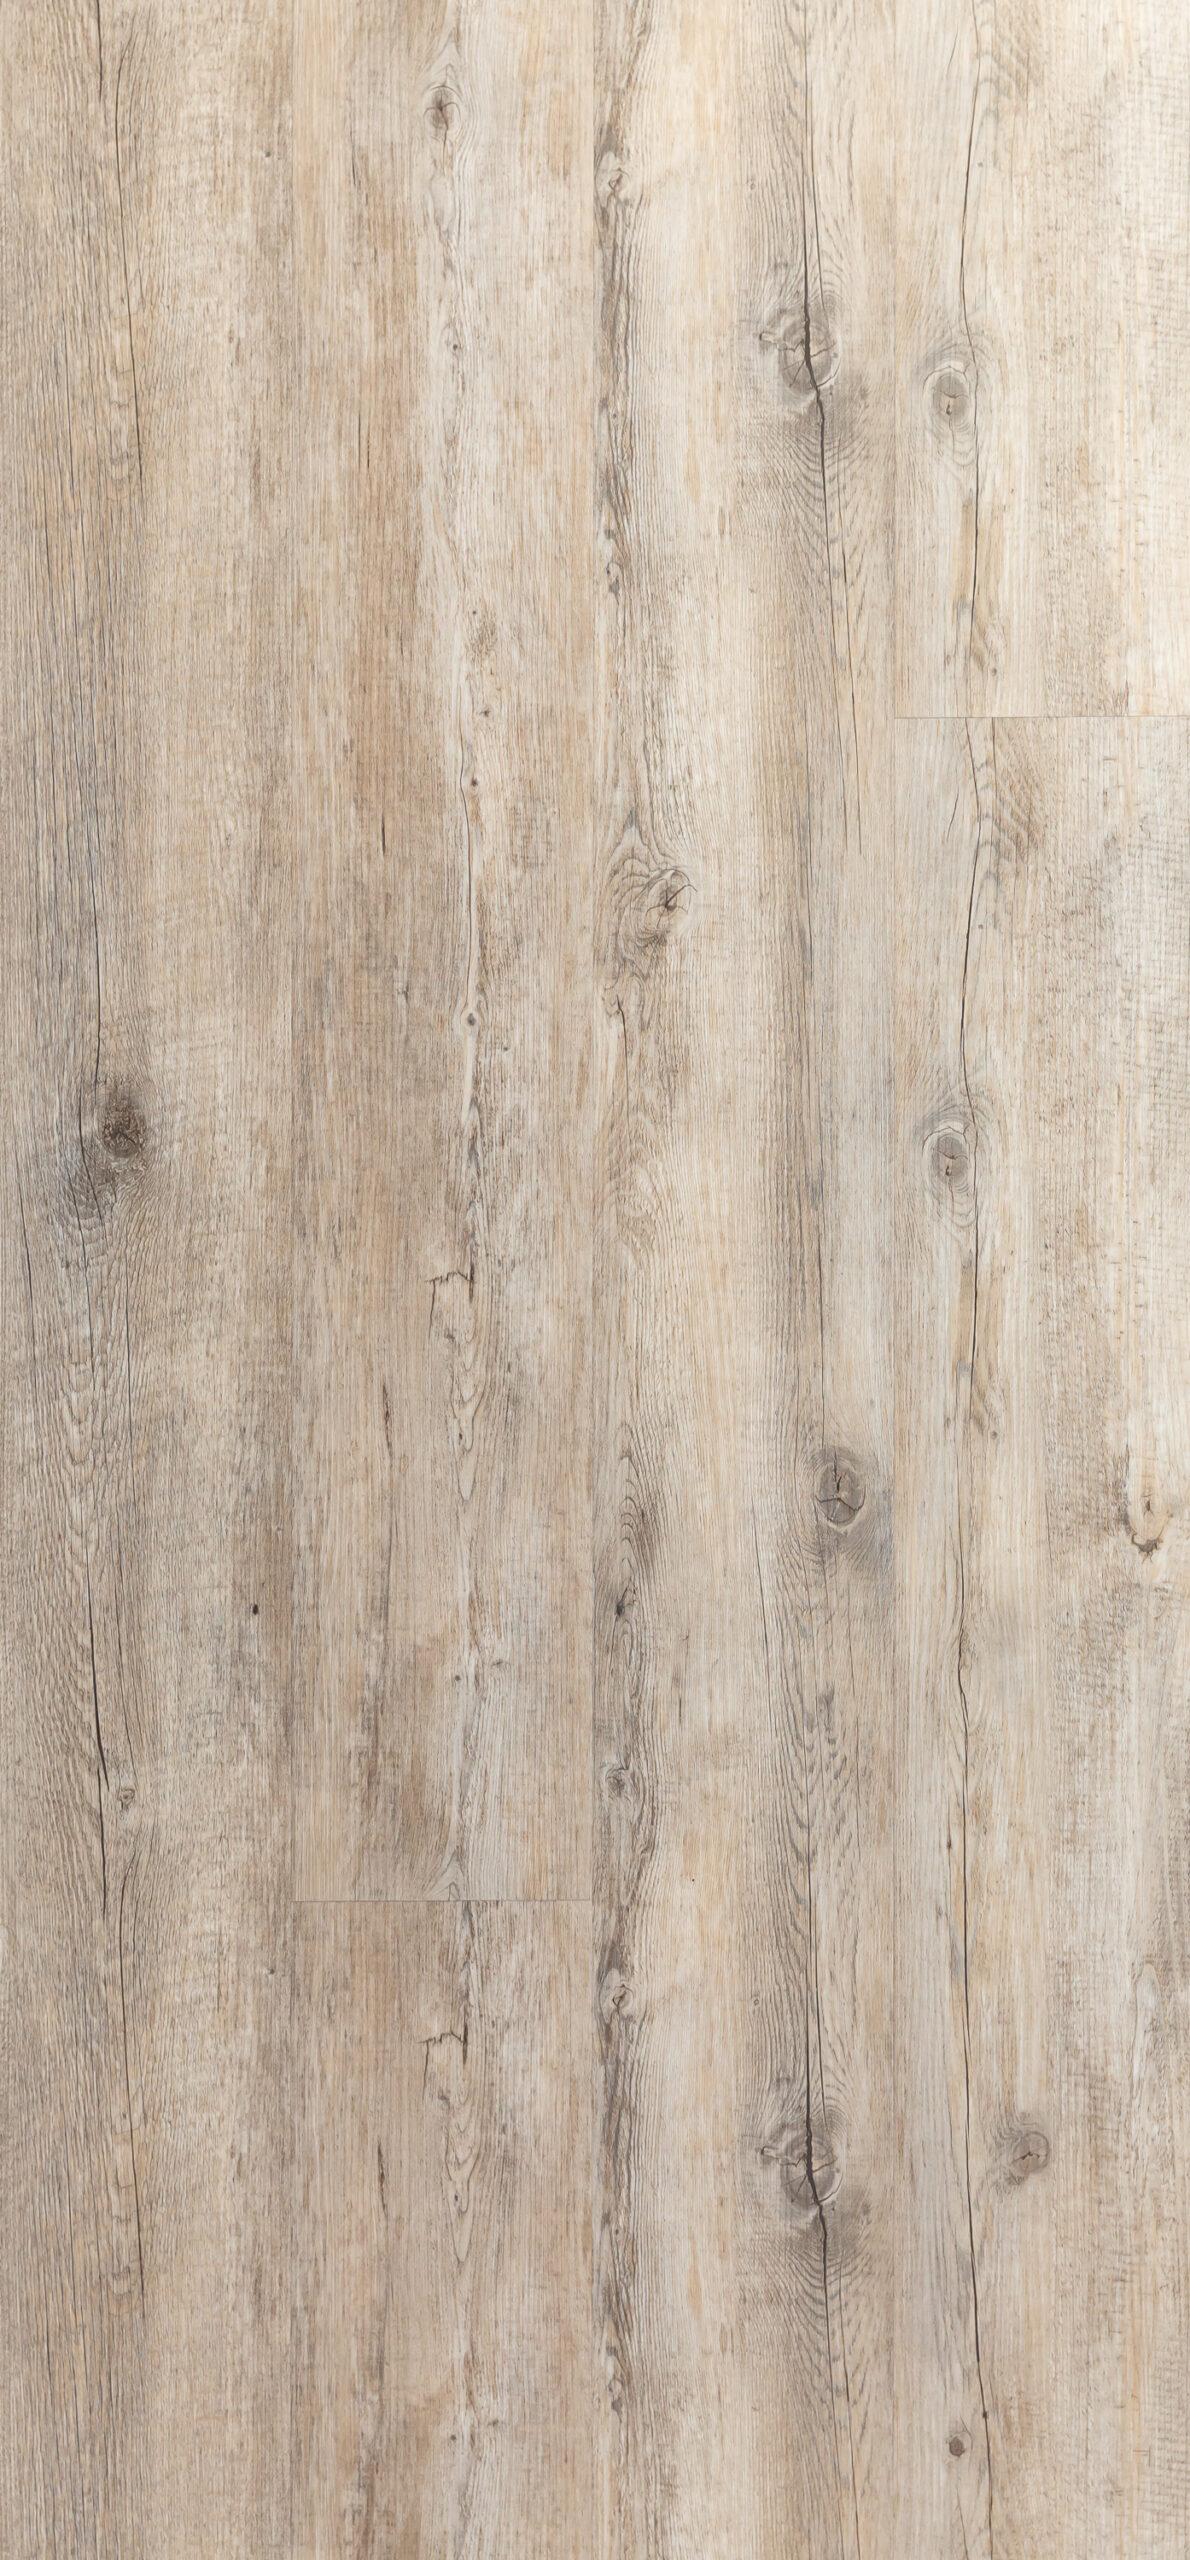 KSW801 Kingswood Long Plank Image